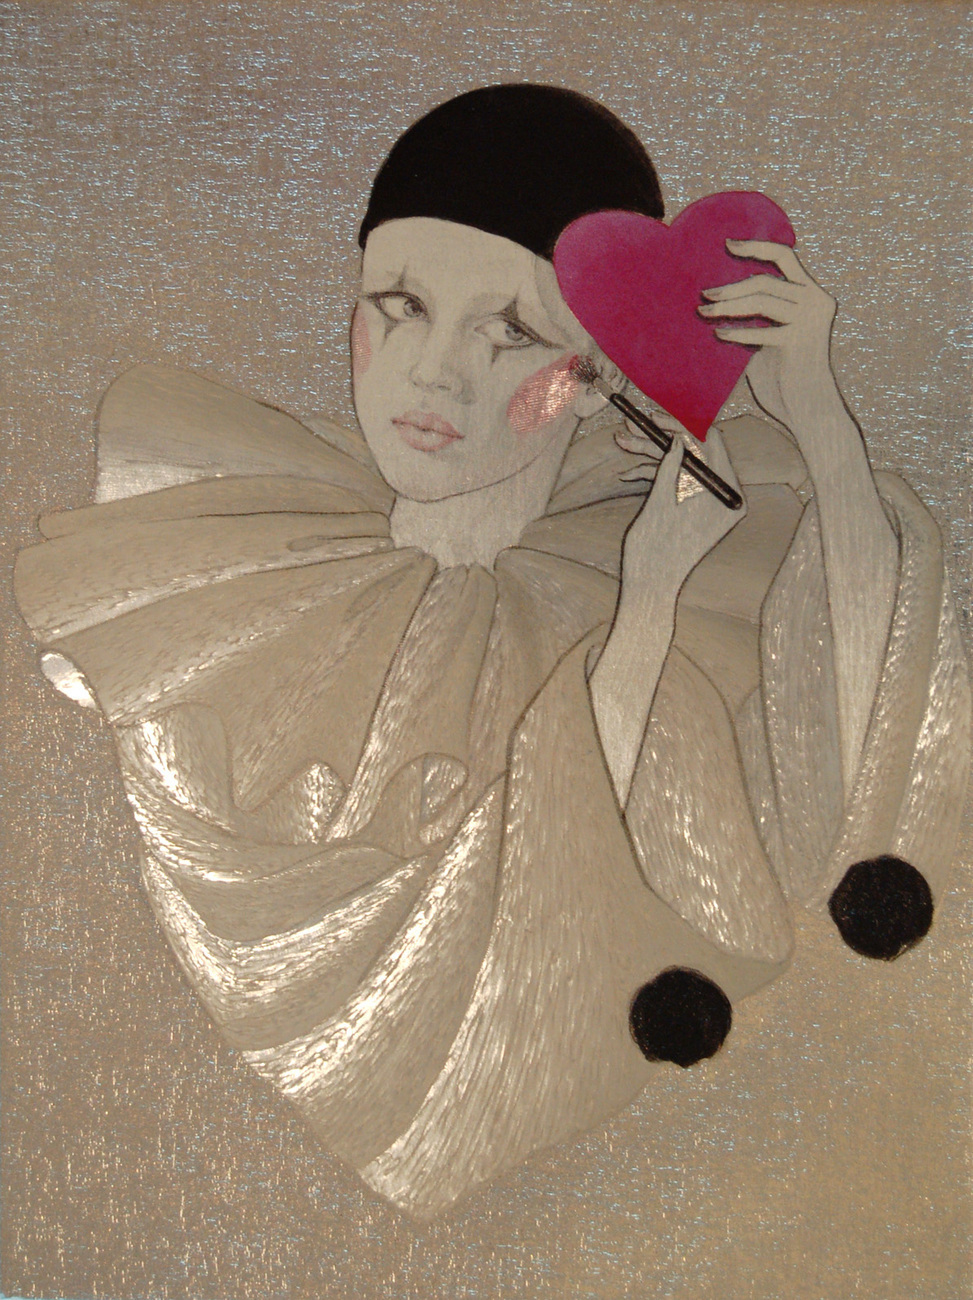 152947 silver clown   big red heart